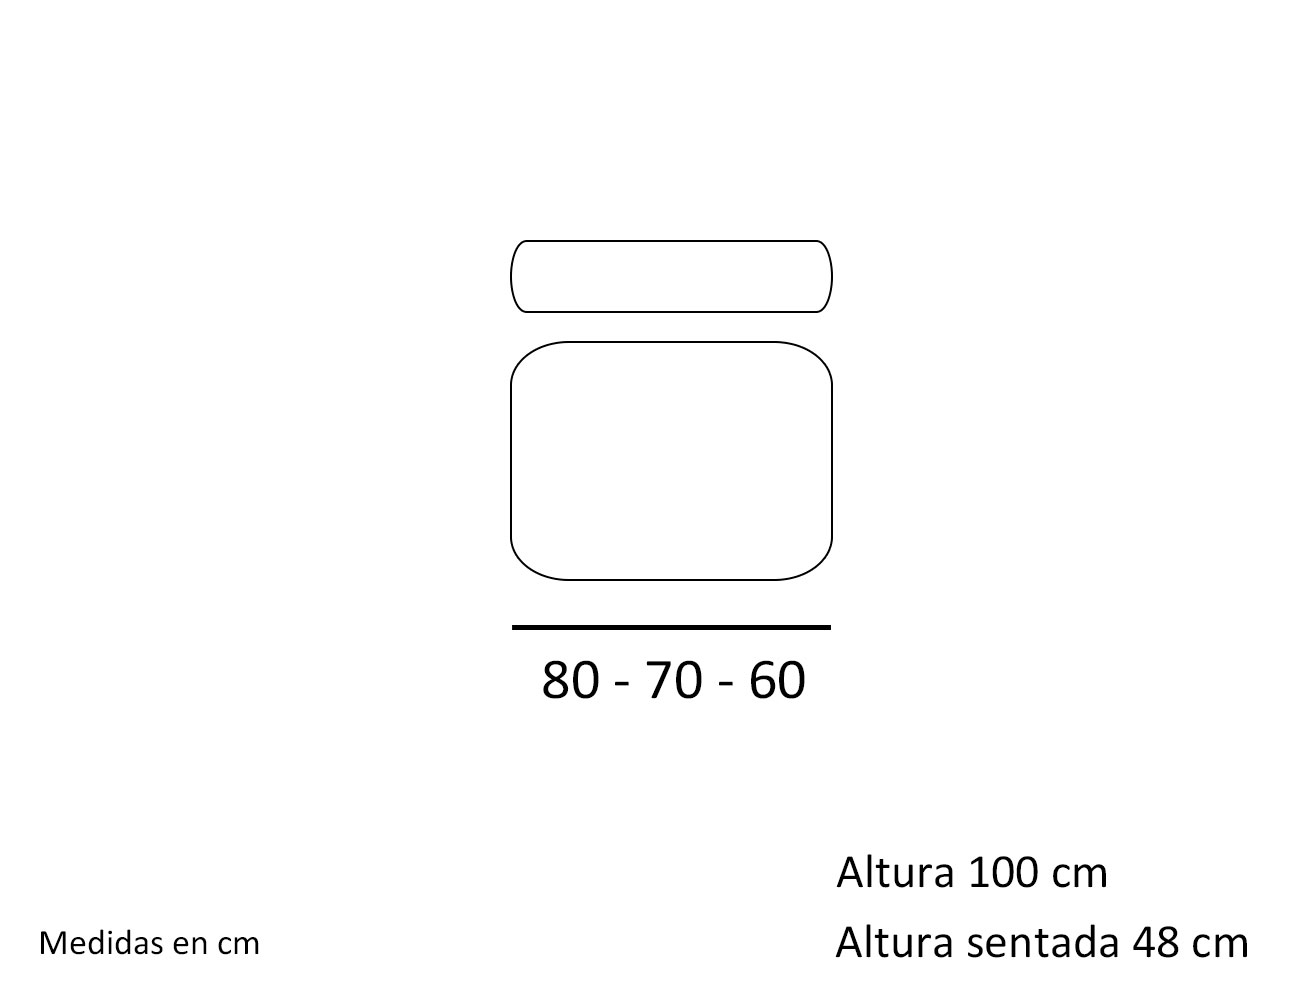 Croquis modulo 1 plaza sin brazo 60 70 80